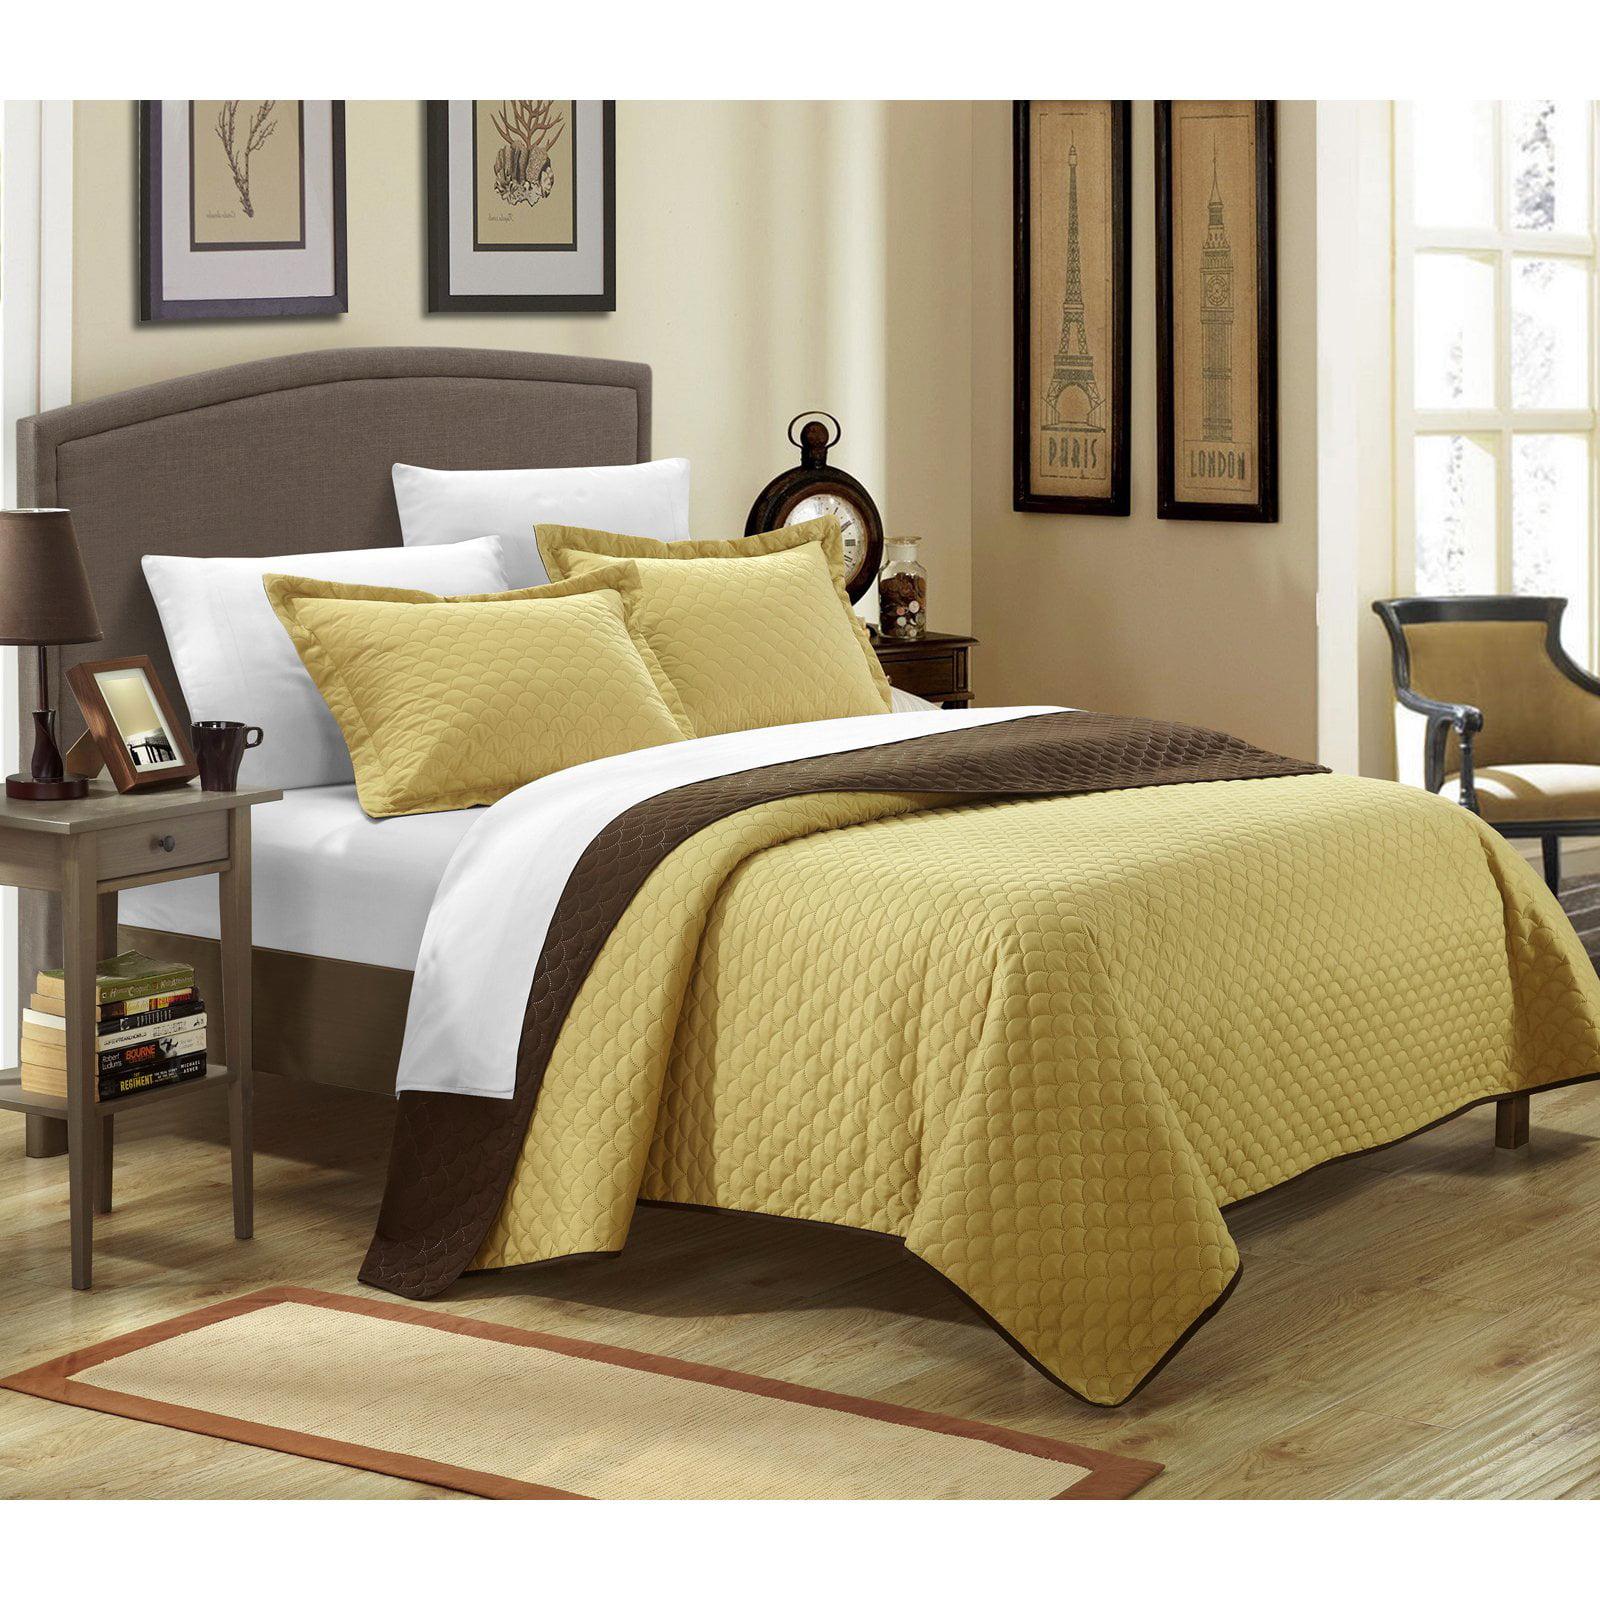 2-Piece Ressa Reversible Color Block Modern Design Quilt with Shams Set